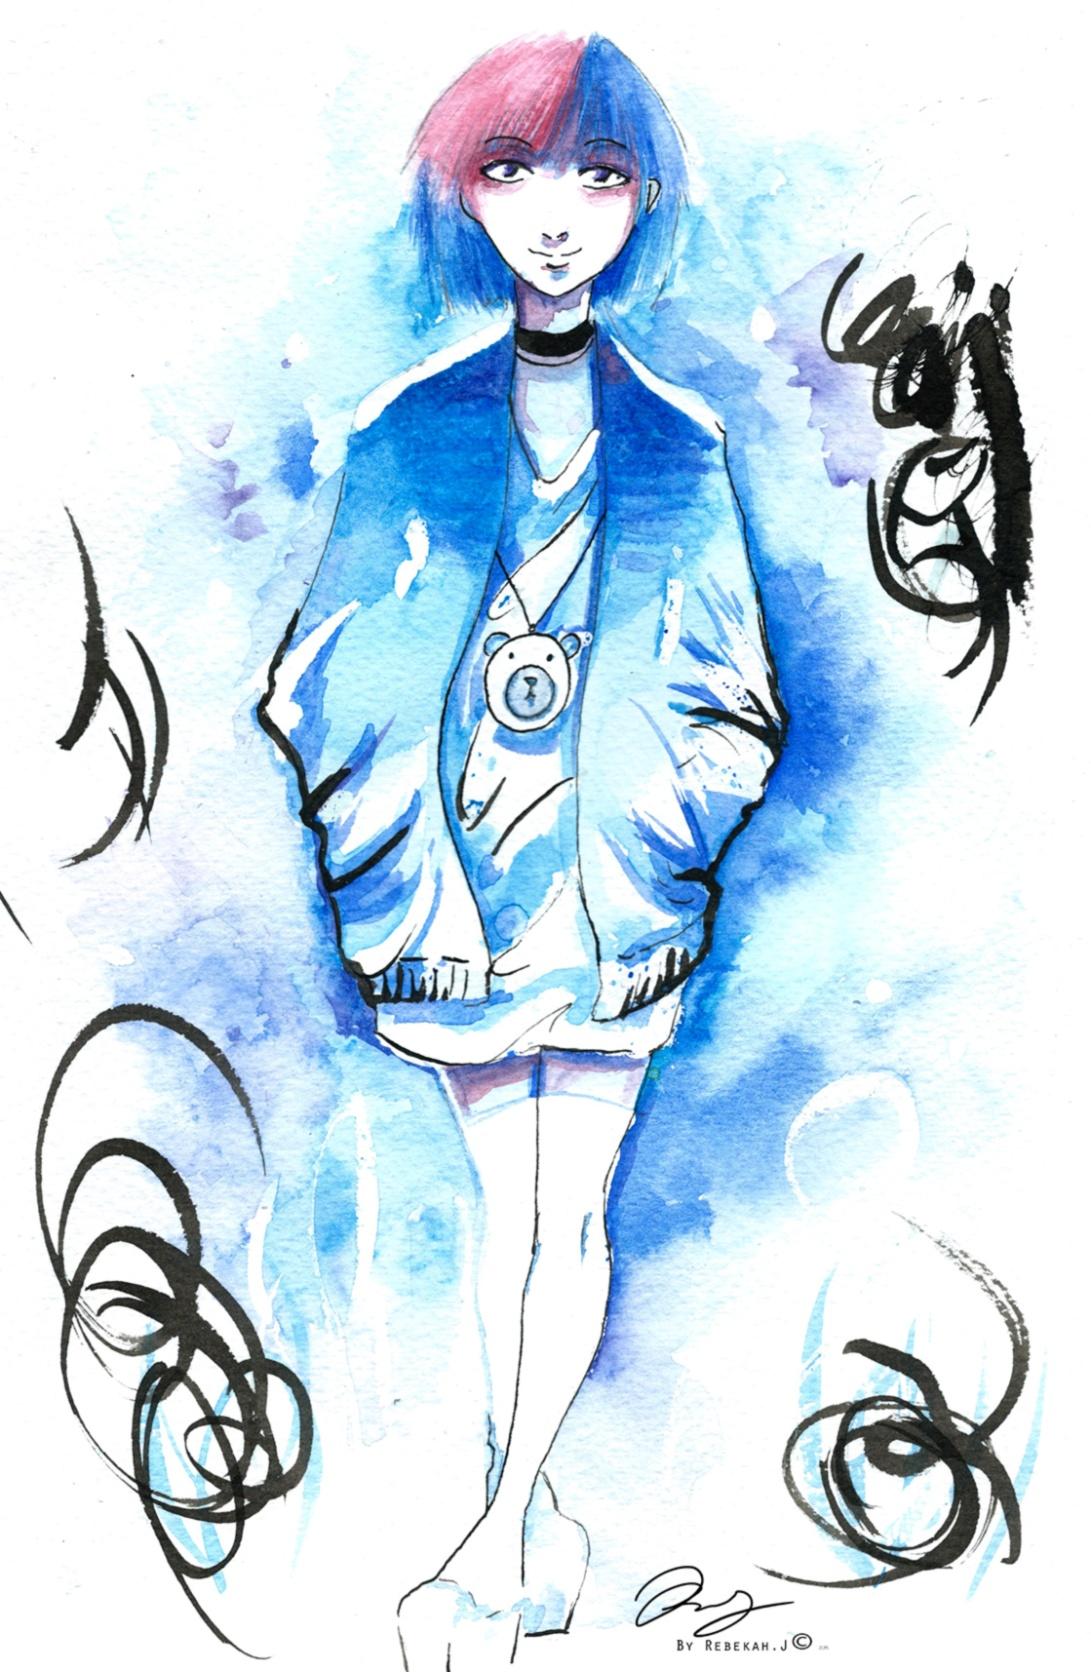 Expressive blue watercolour portrait drawing, 2016 by Rebekah Joseph